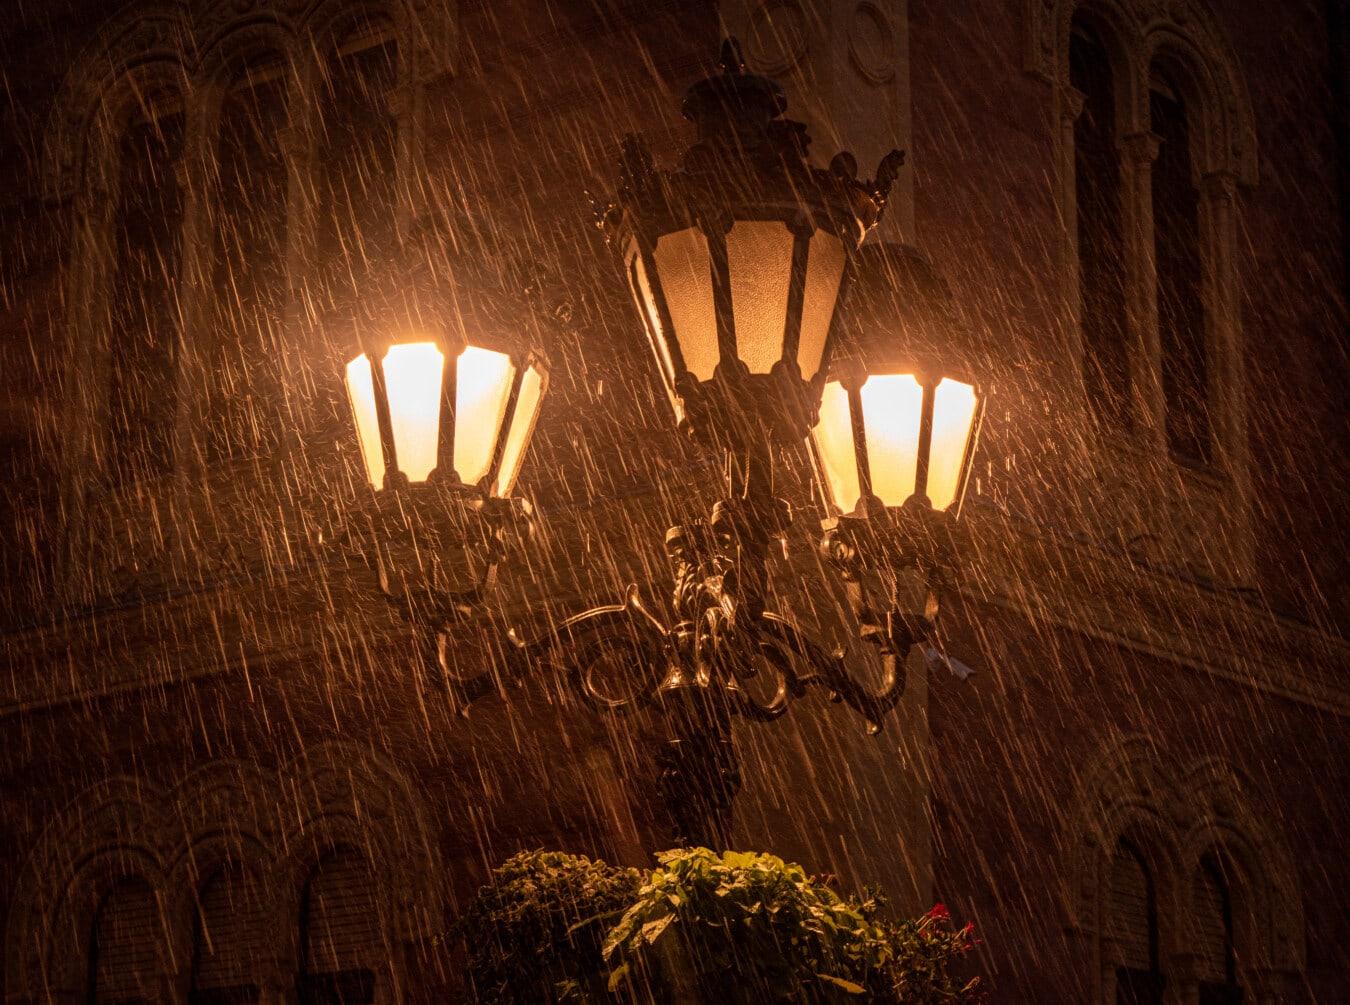 cast iron, classic, baroque, lantern, rain, night, lamp, light, dark, old